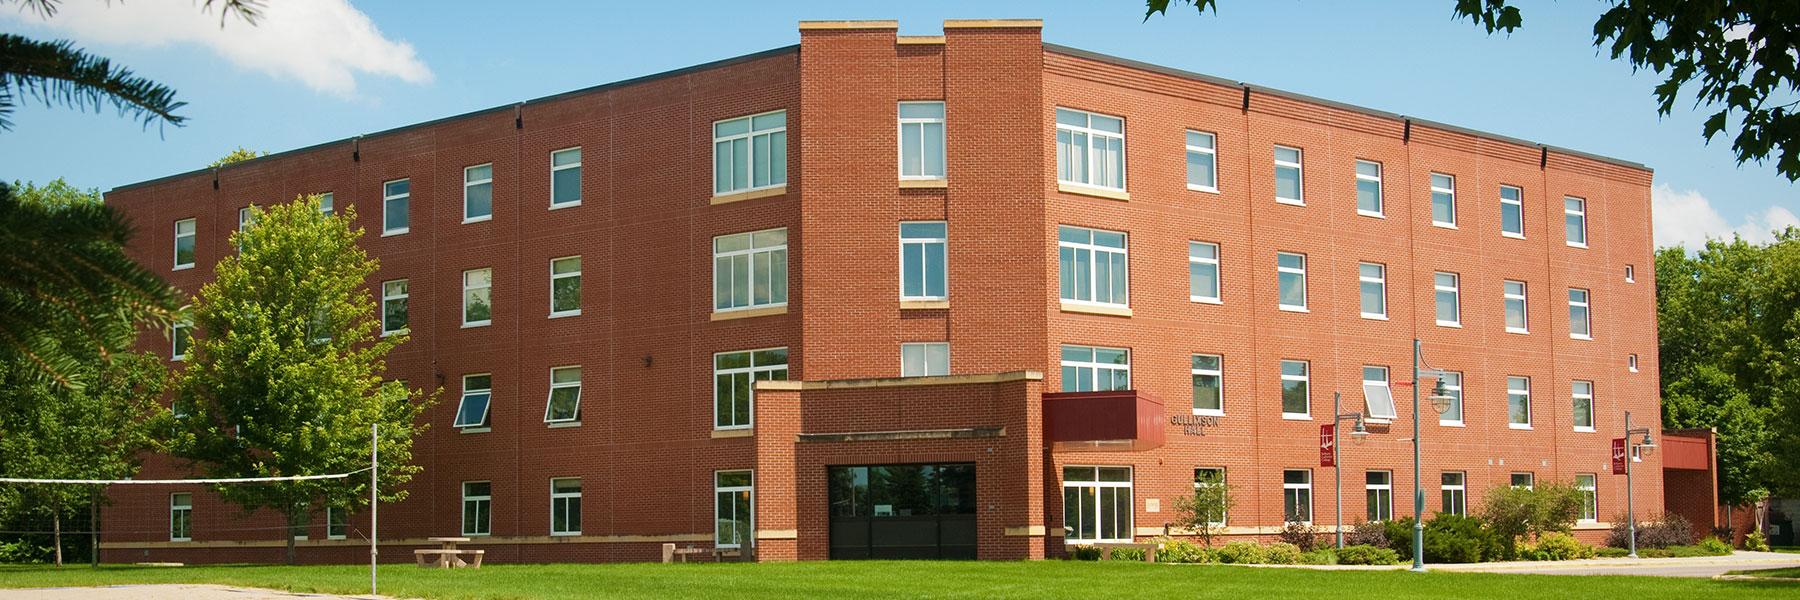 Gullixson Hall